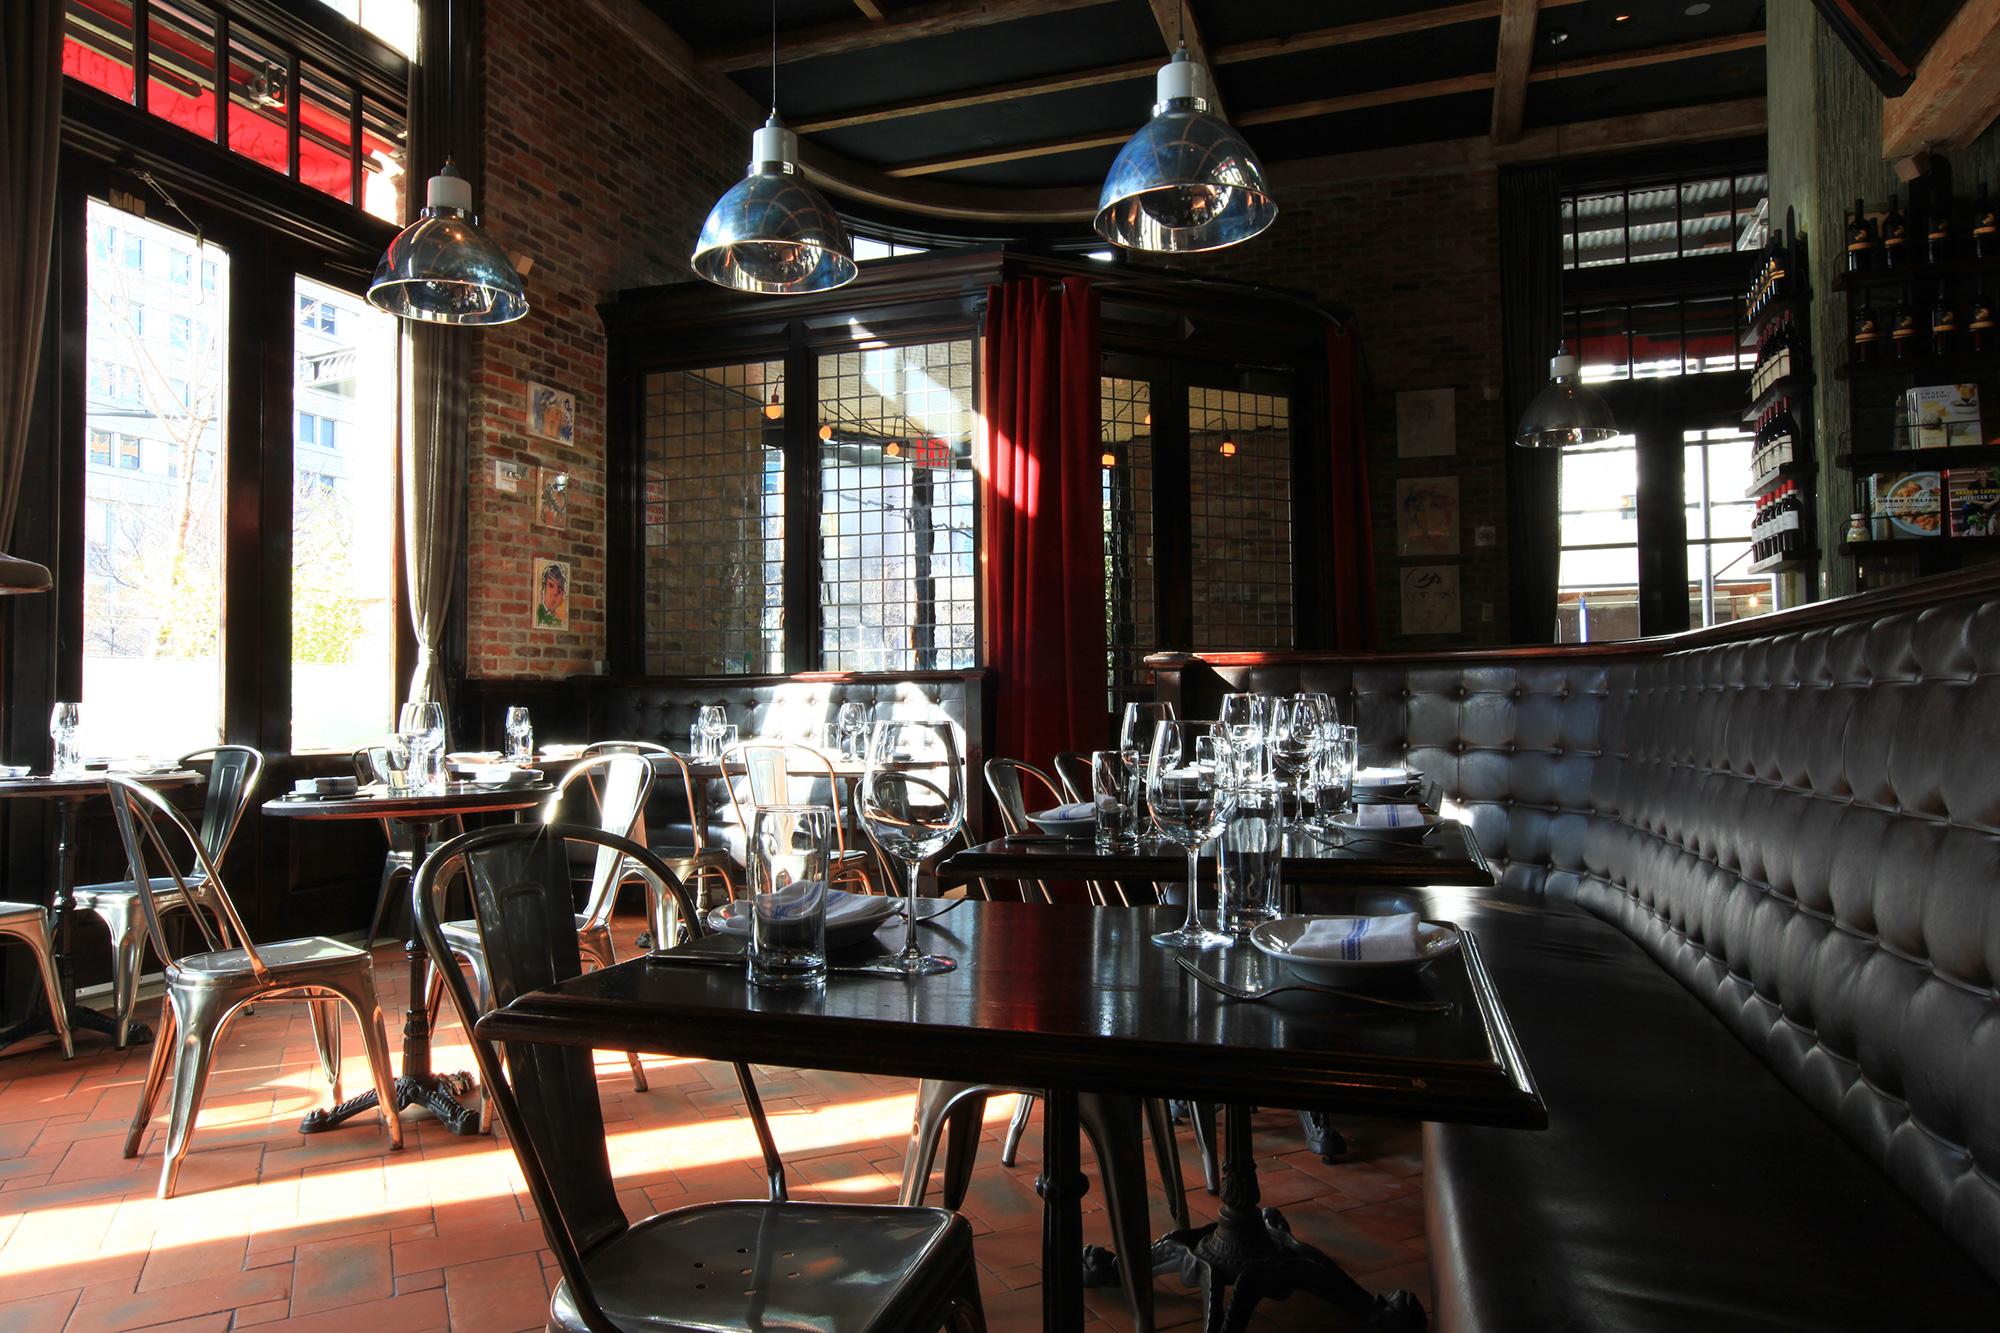 greenwich-hotel-Locanda-Banquet-Seating-High.jpg